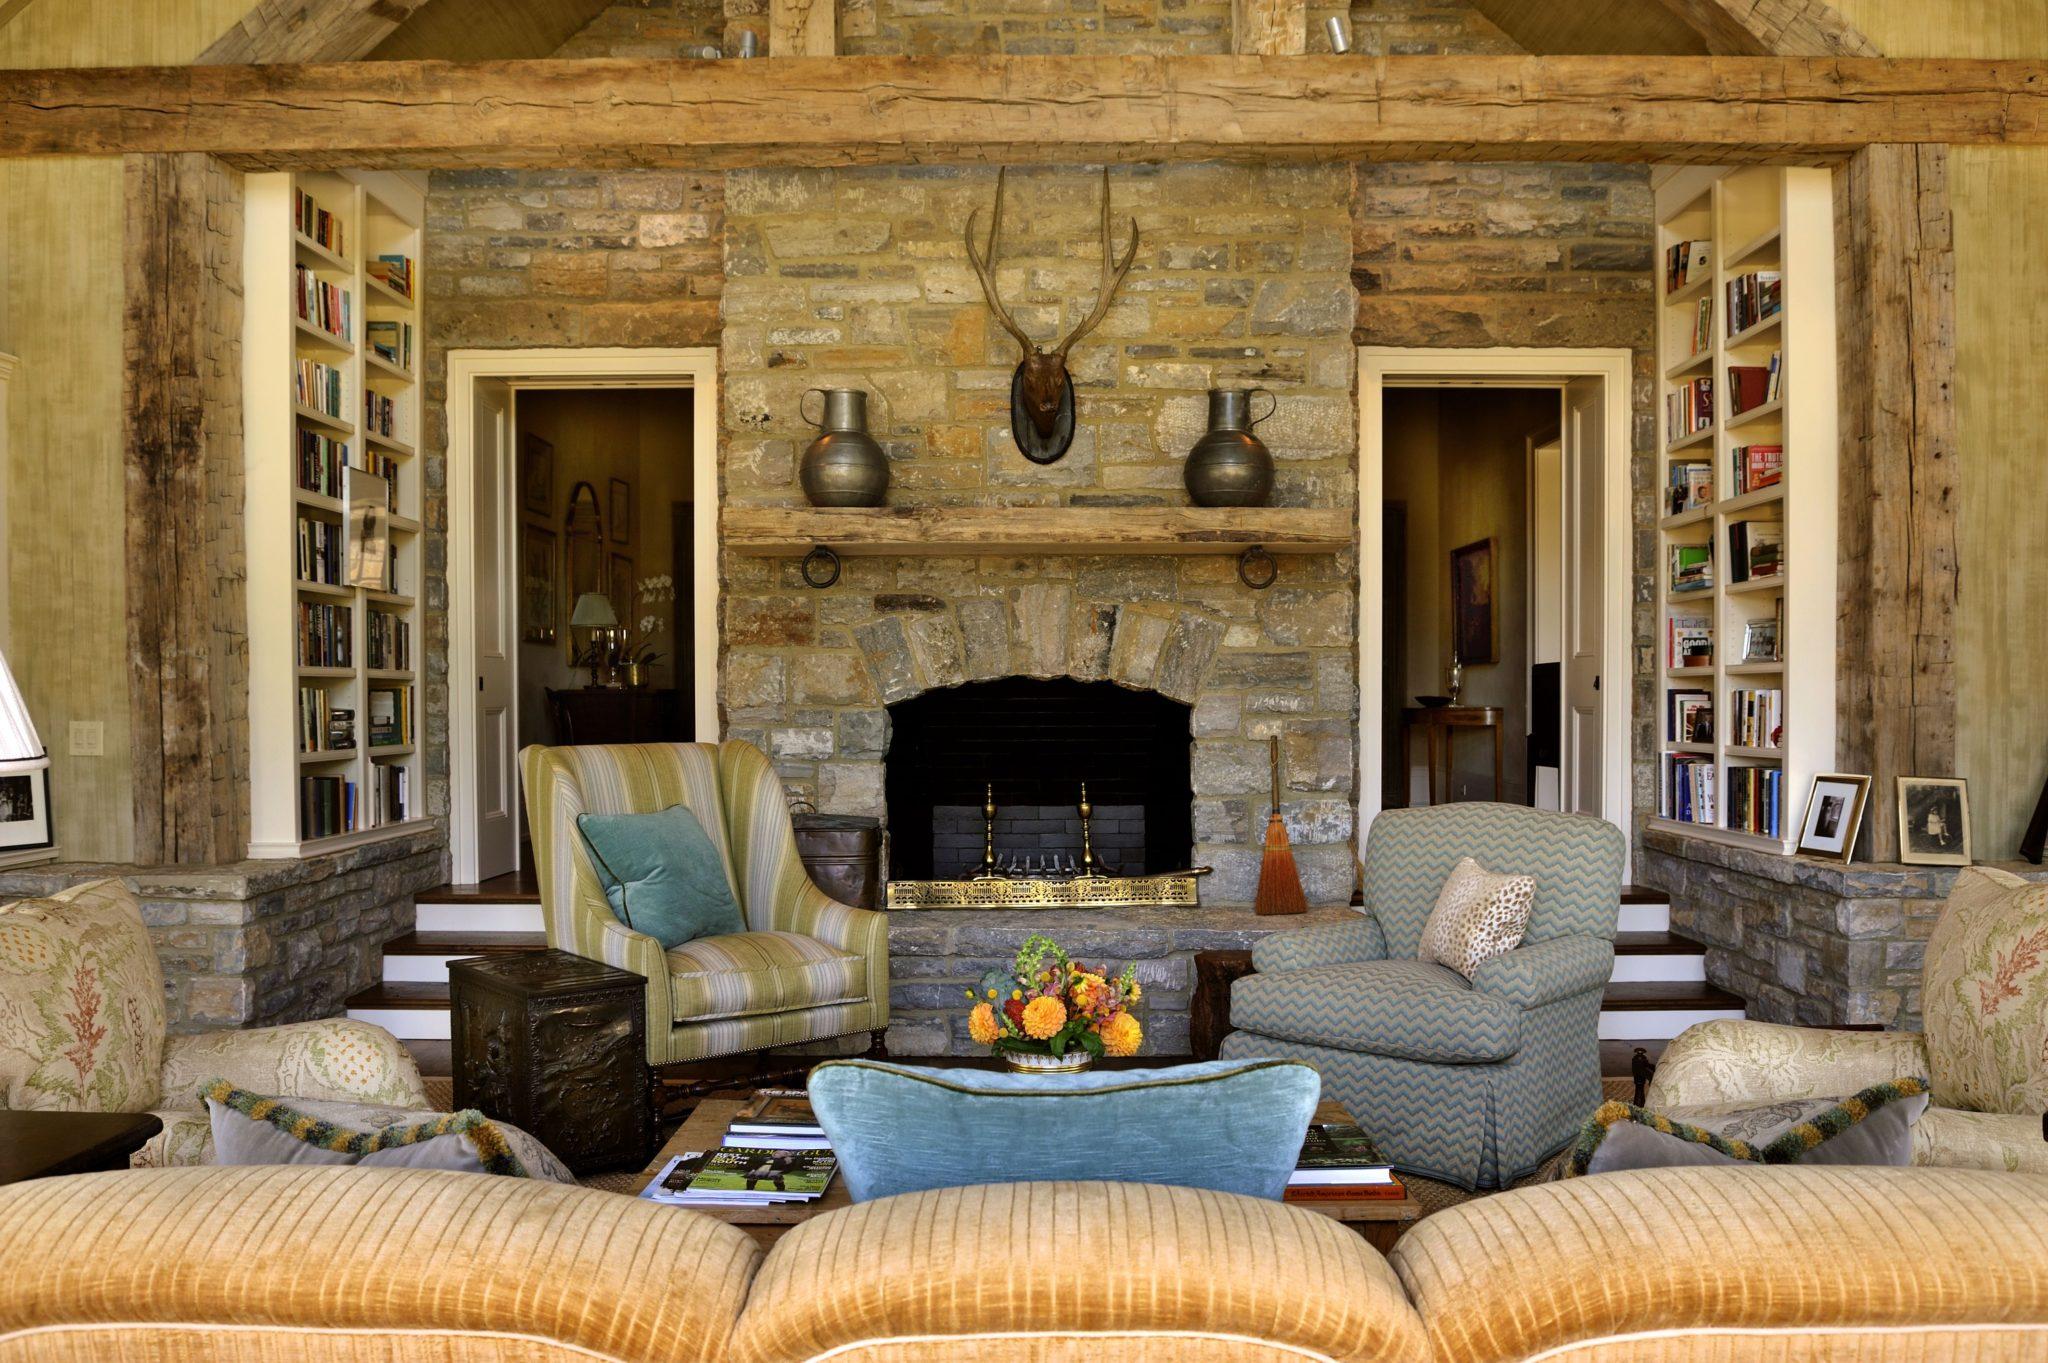 Interior design byMatthew Carter Interiors